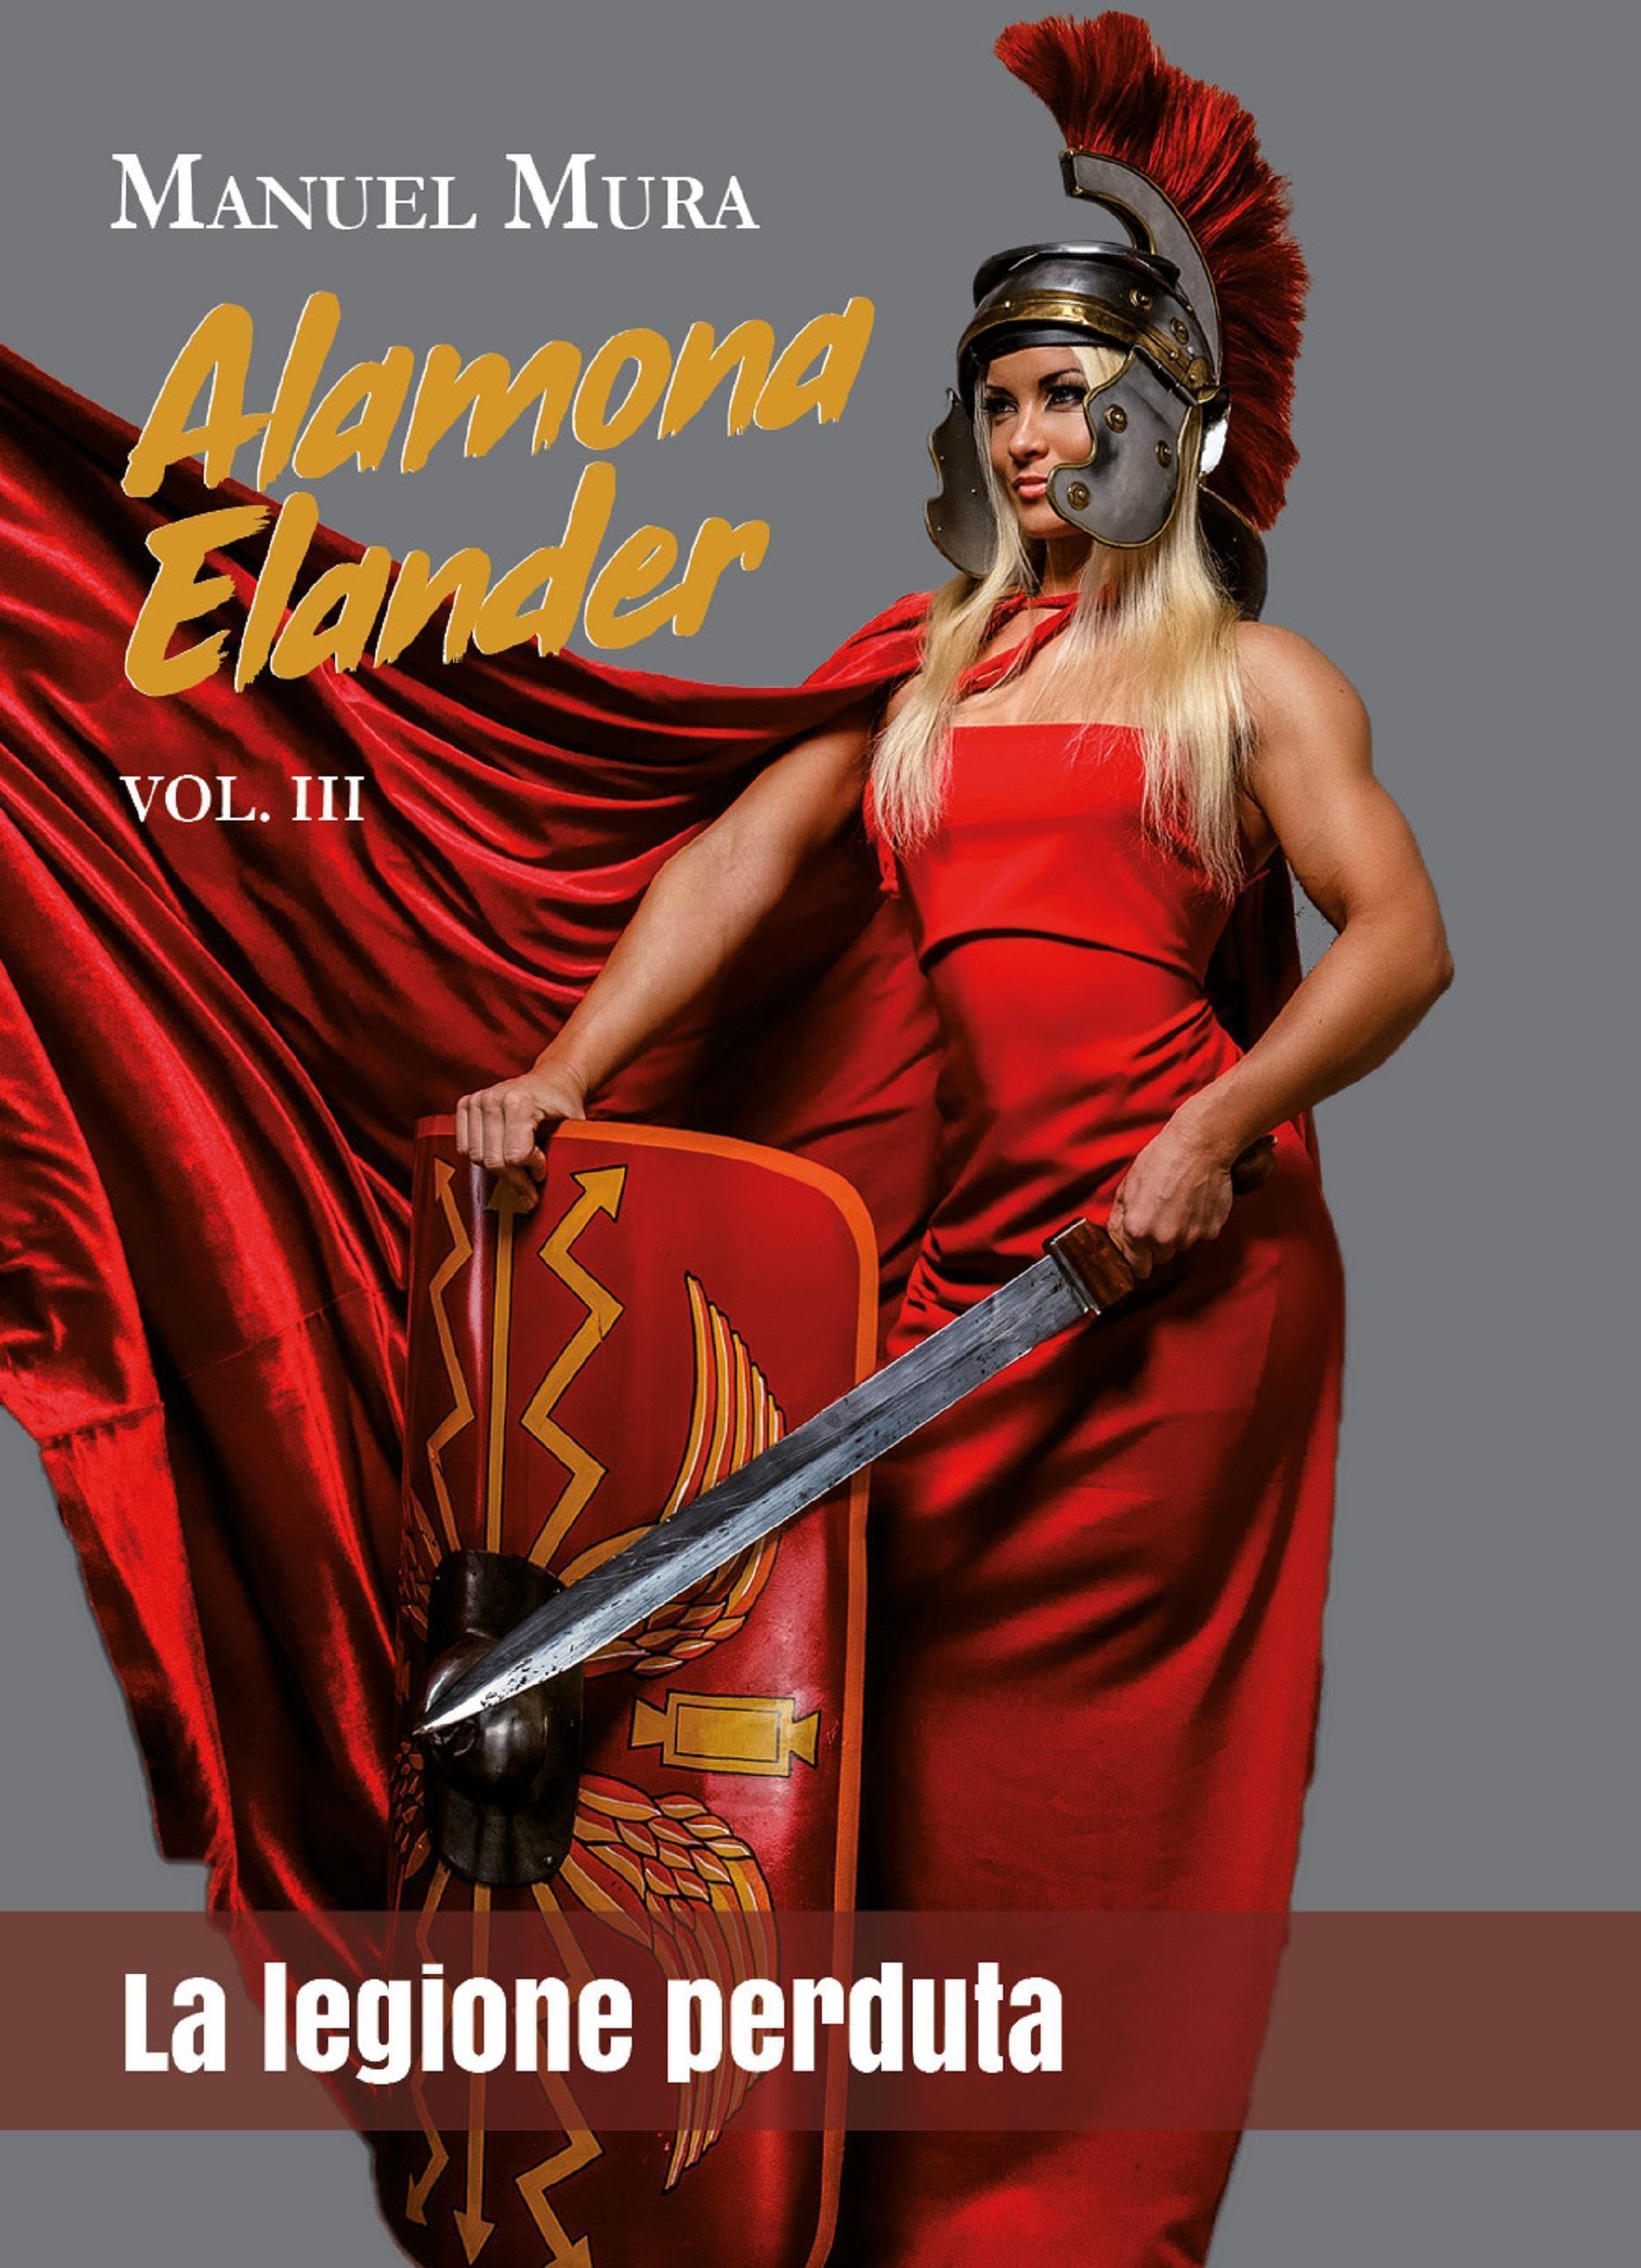 Alamona Elander vol.3 - La legione perduta